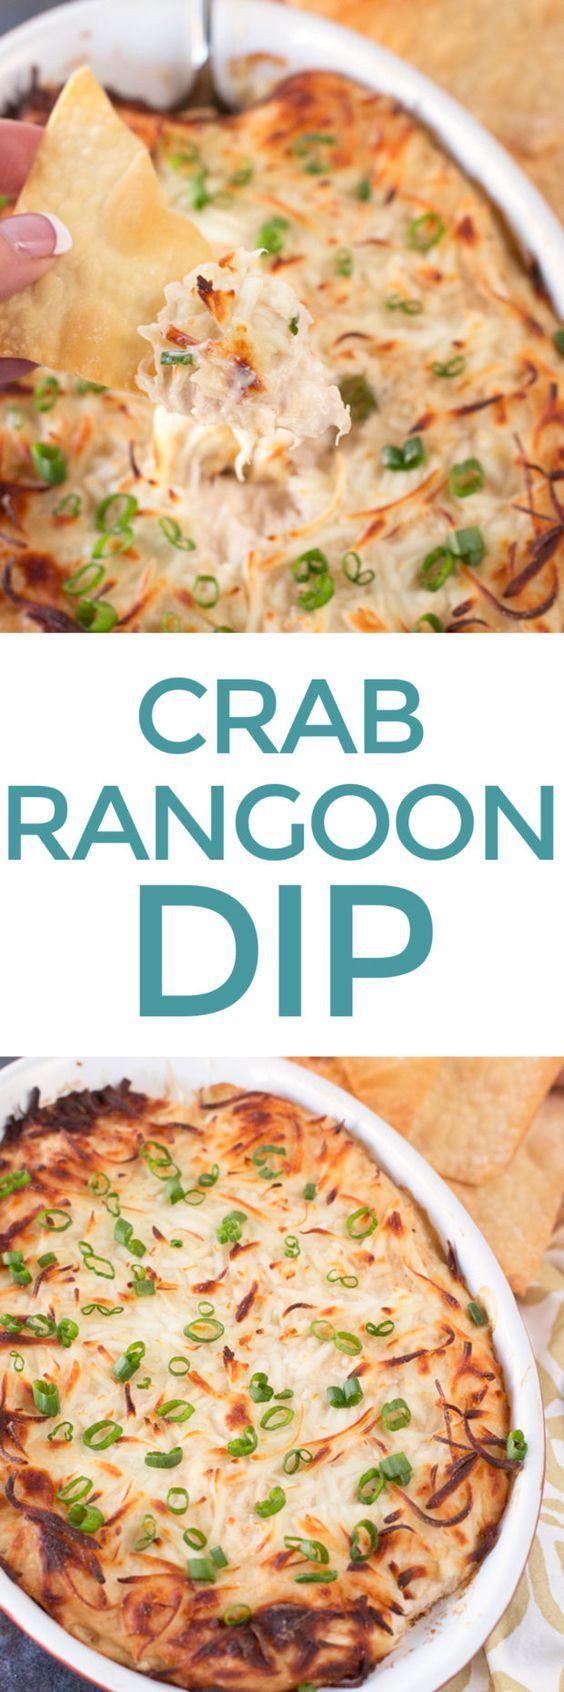 Crab Rangoon Dip with Crispy Won Ton Chips – Cake 'n Knife